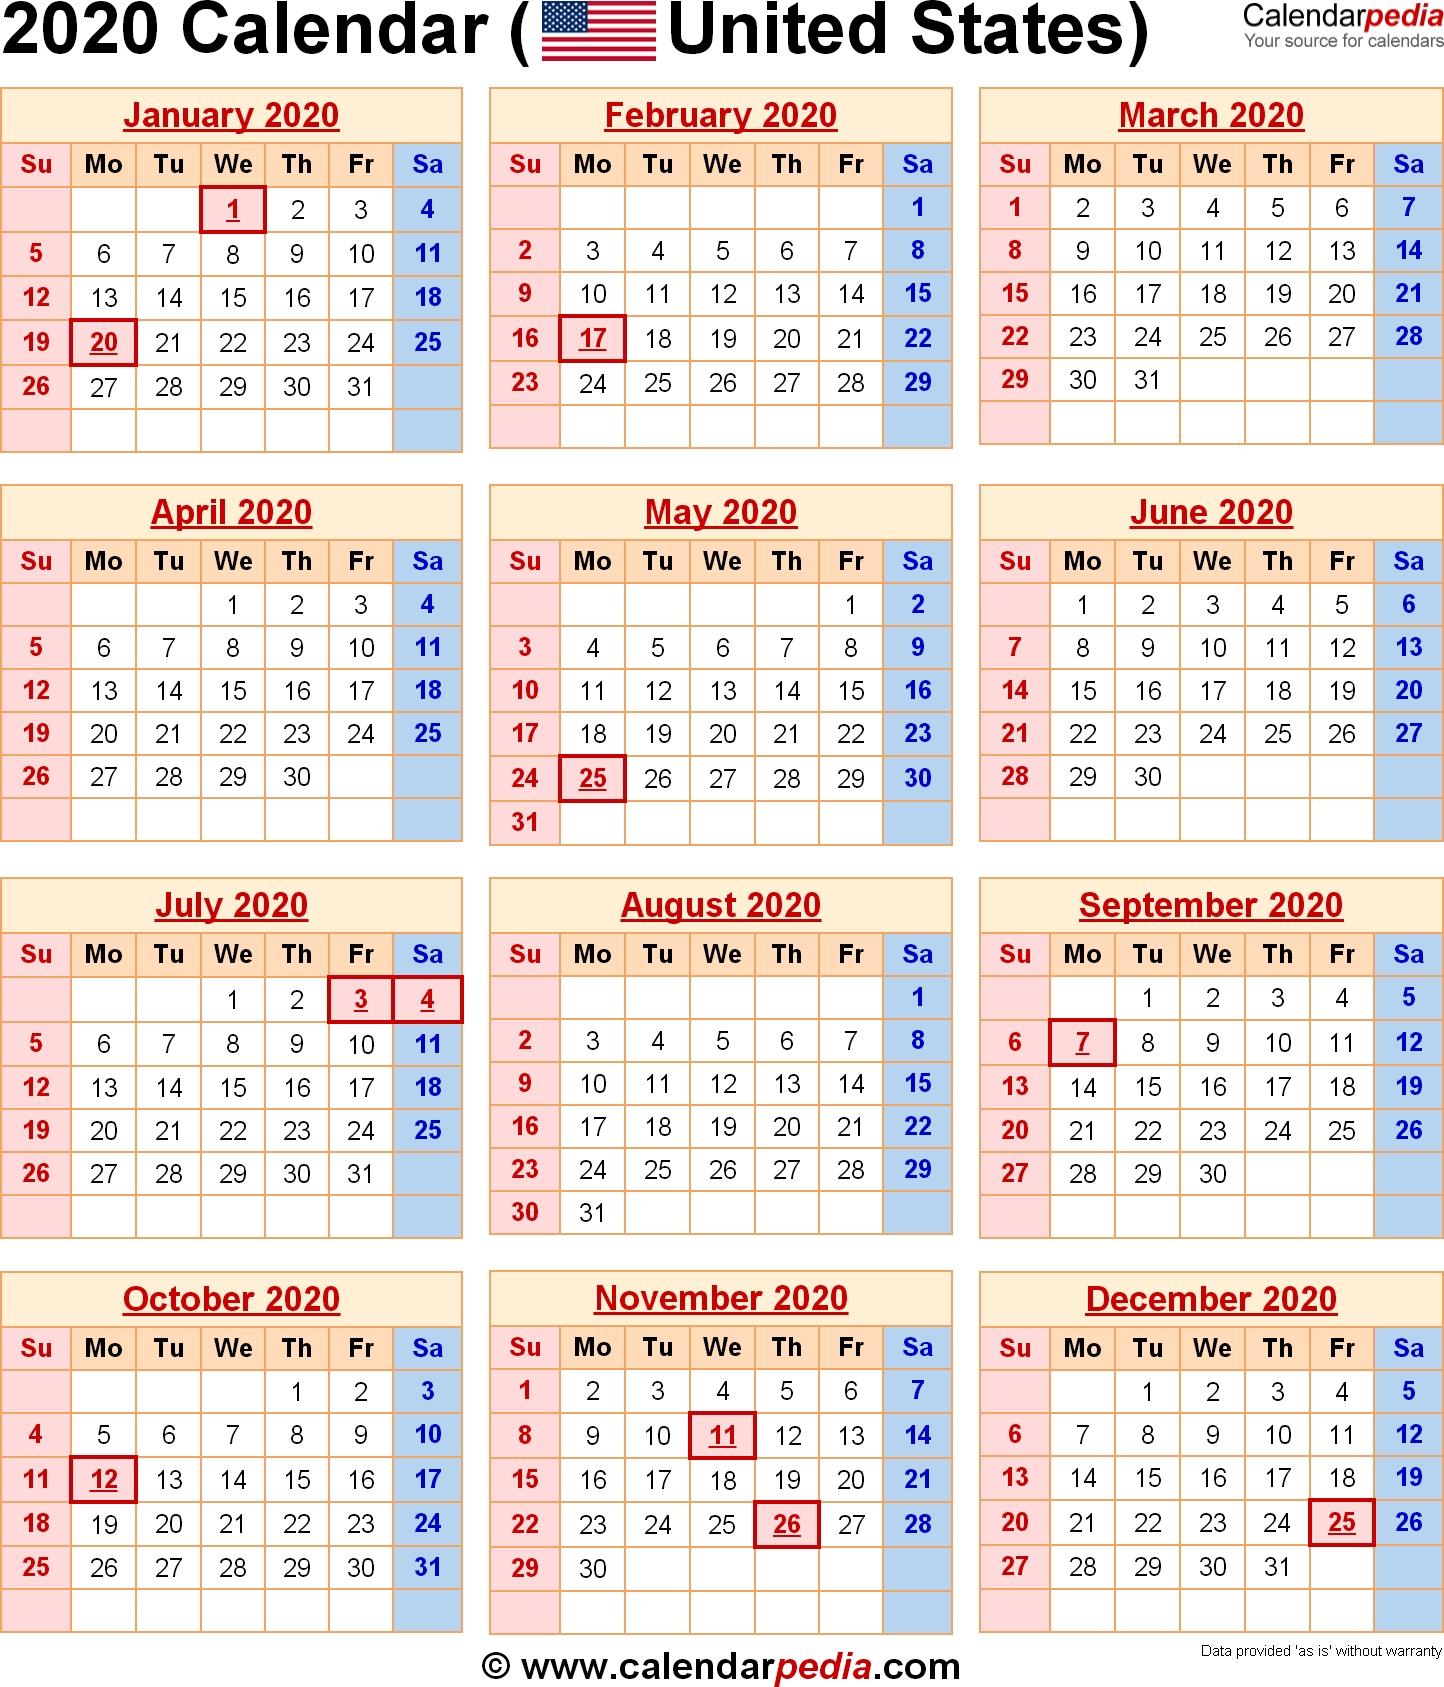 2020 Calendar With Federal Holidays-Calendar For 2020 Indicating Public Holidays